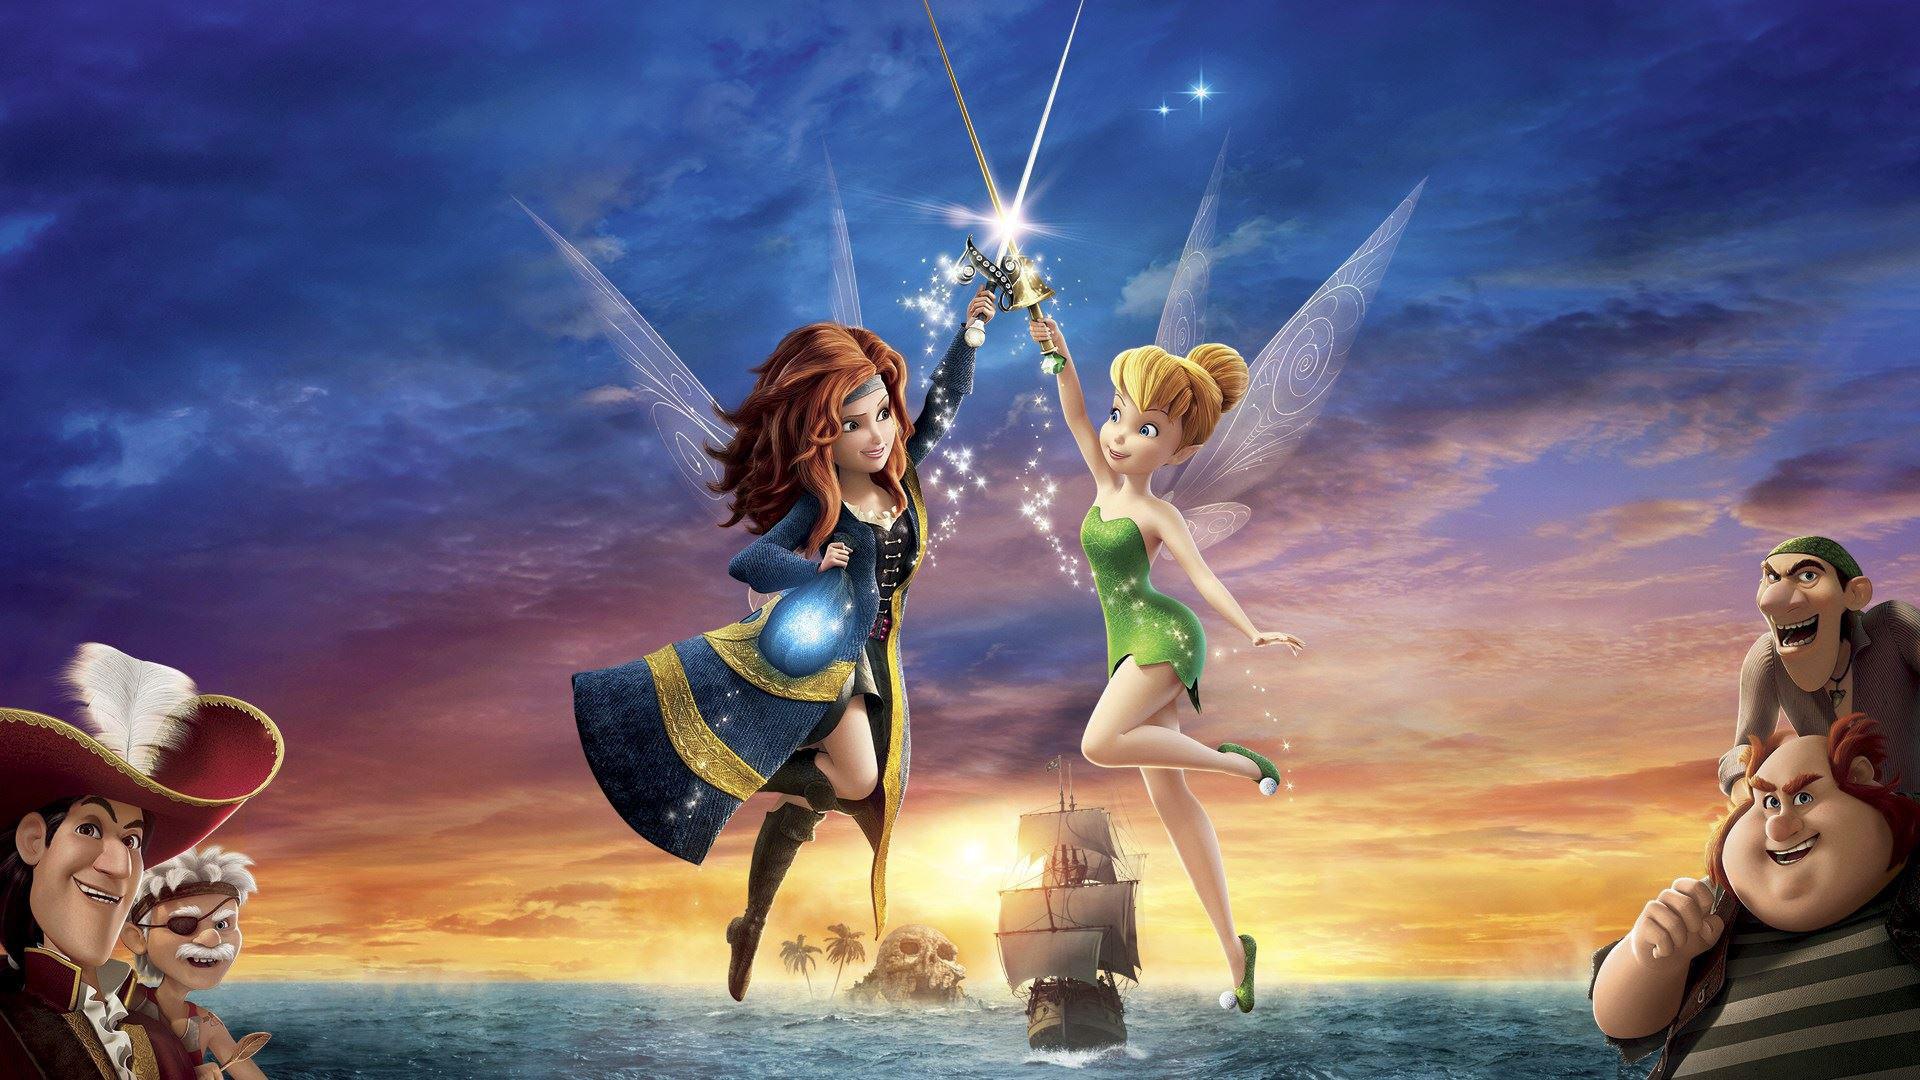 Pirate Fairy Movie Poster